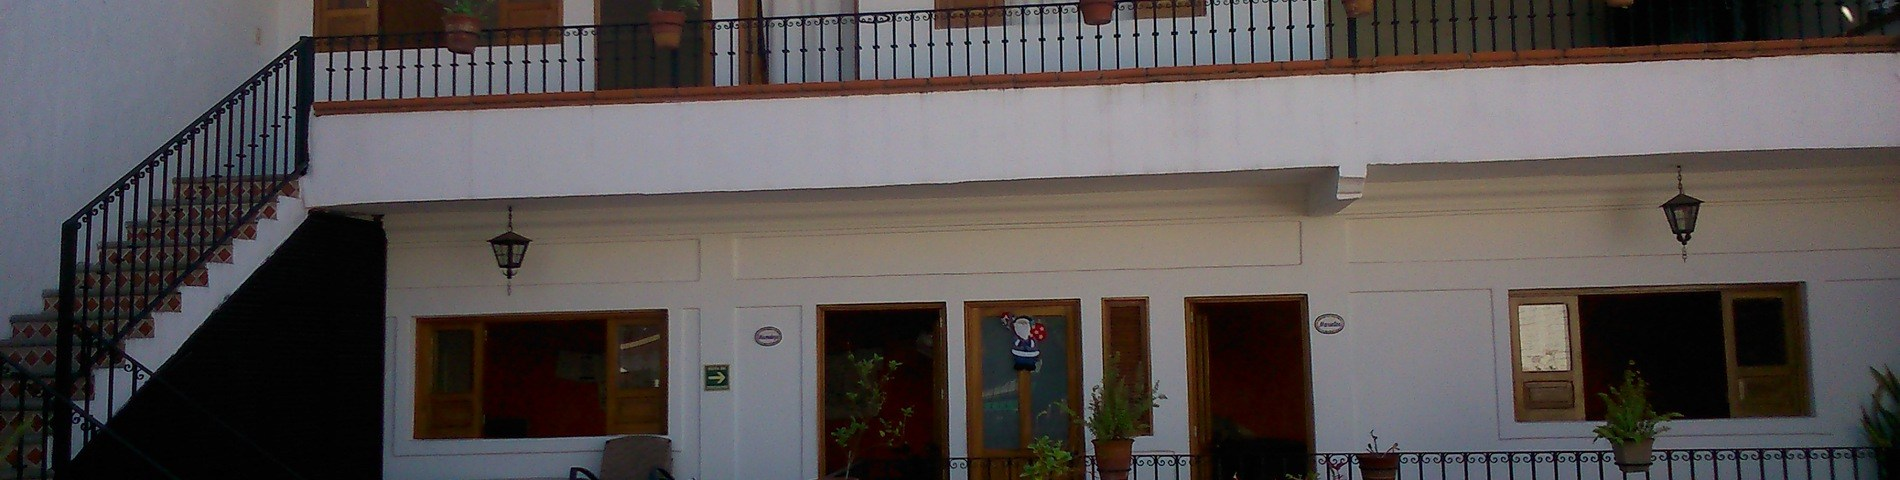 Imagen 1 de la escuela Spanish Experience Center